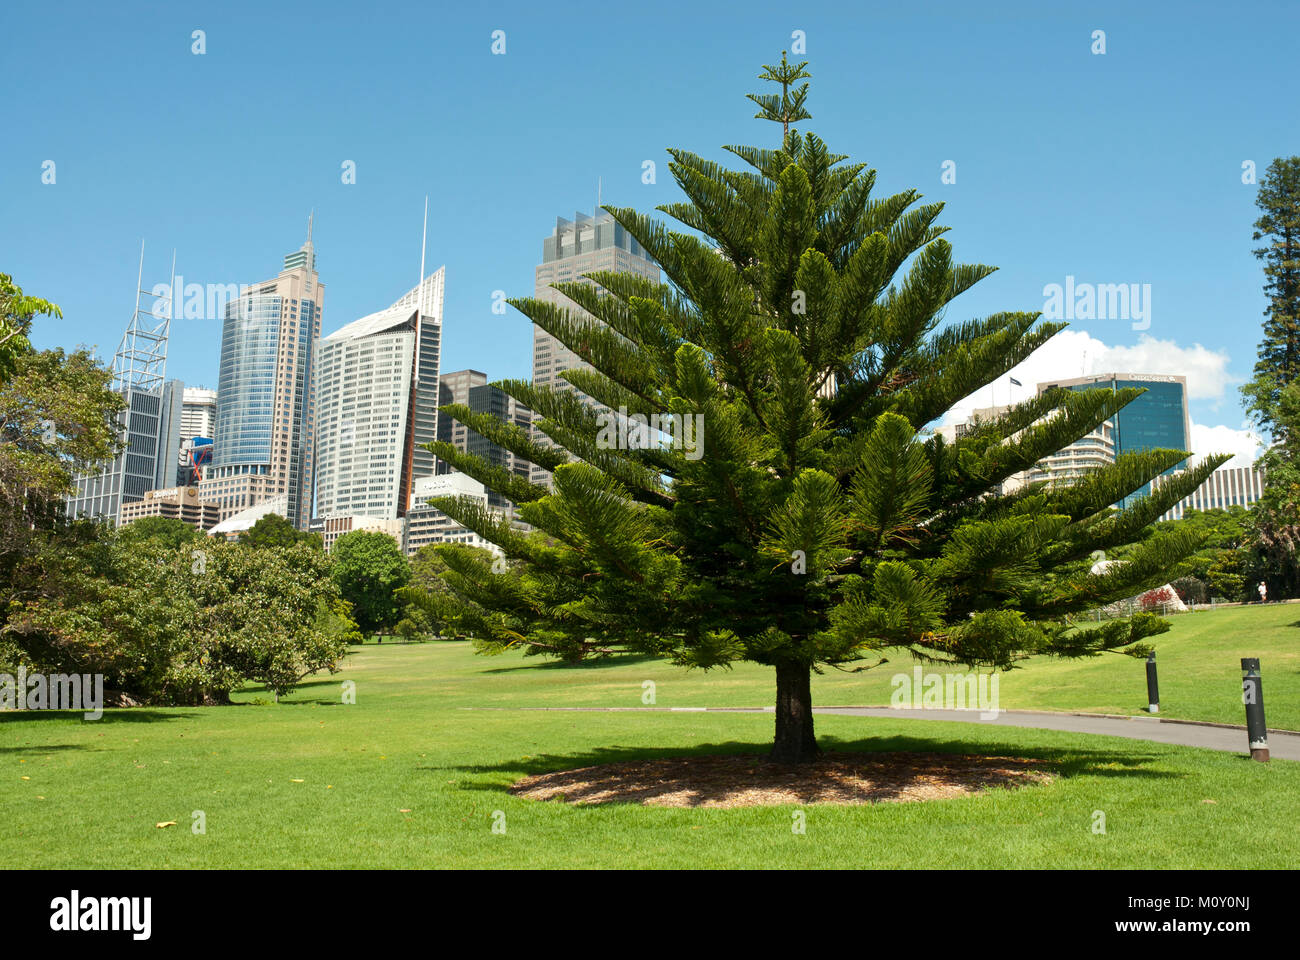 Royal Botanic Garden Sydney on a sunny day with high rise CBD in background. Blue sky. Specimen tree. - Stock Image